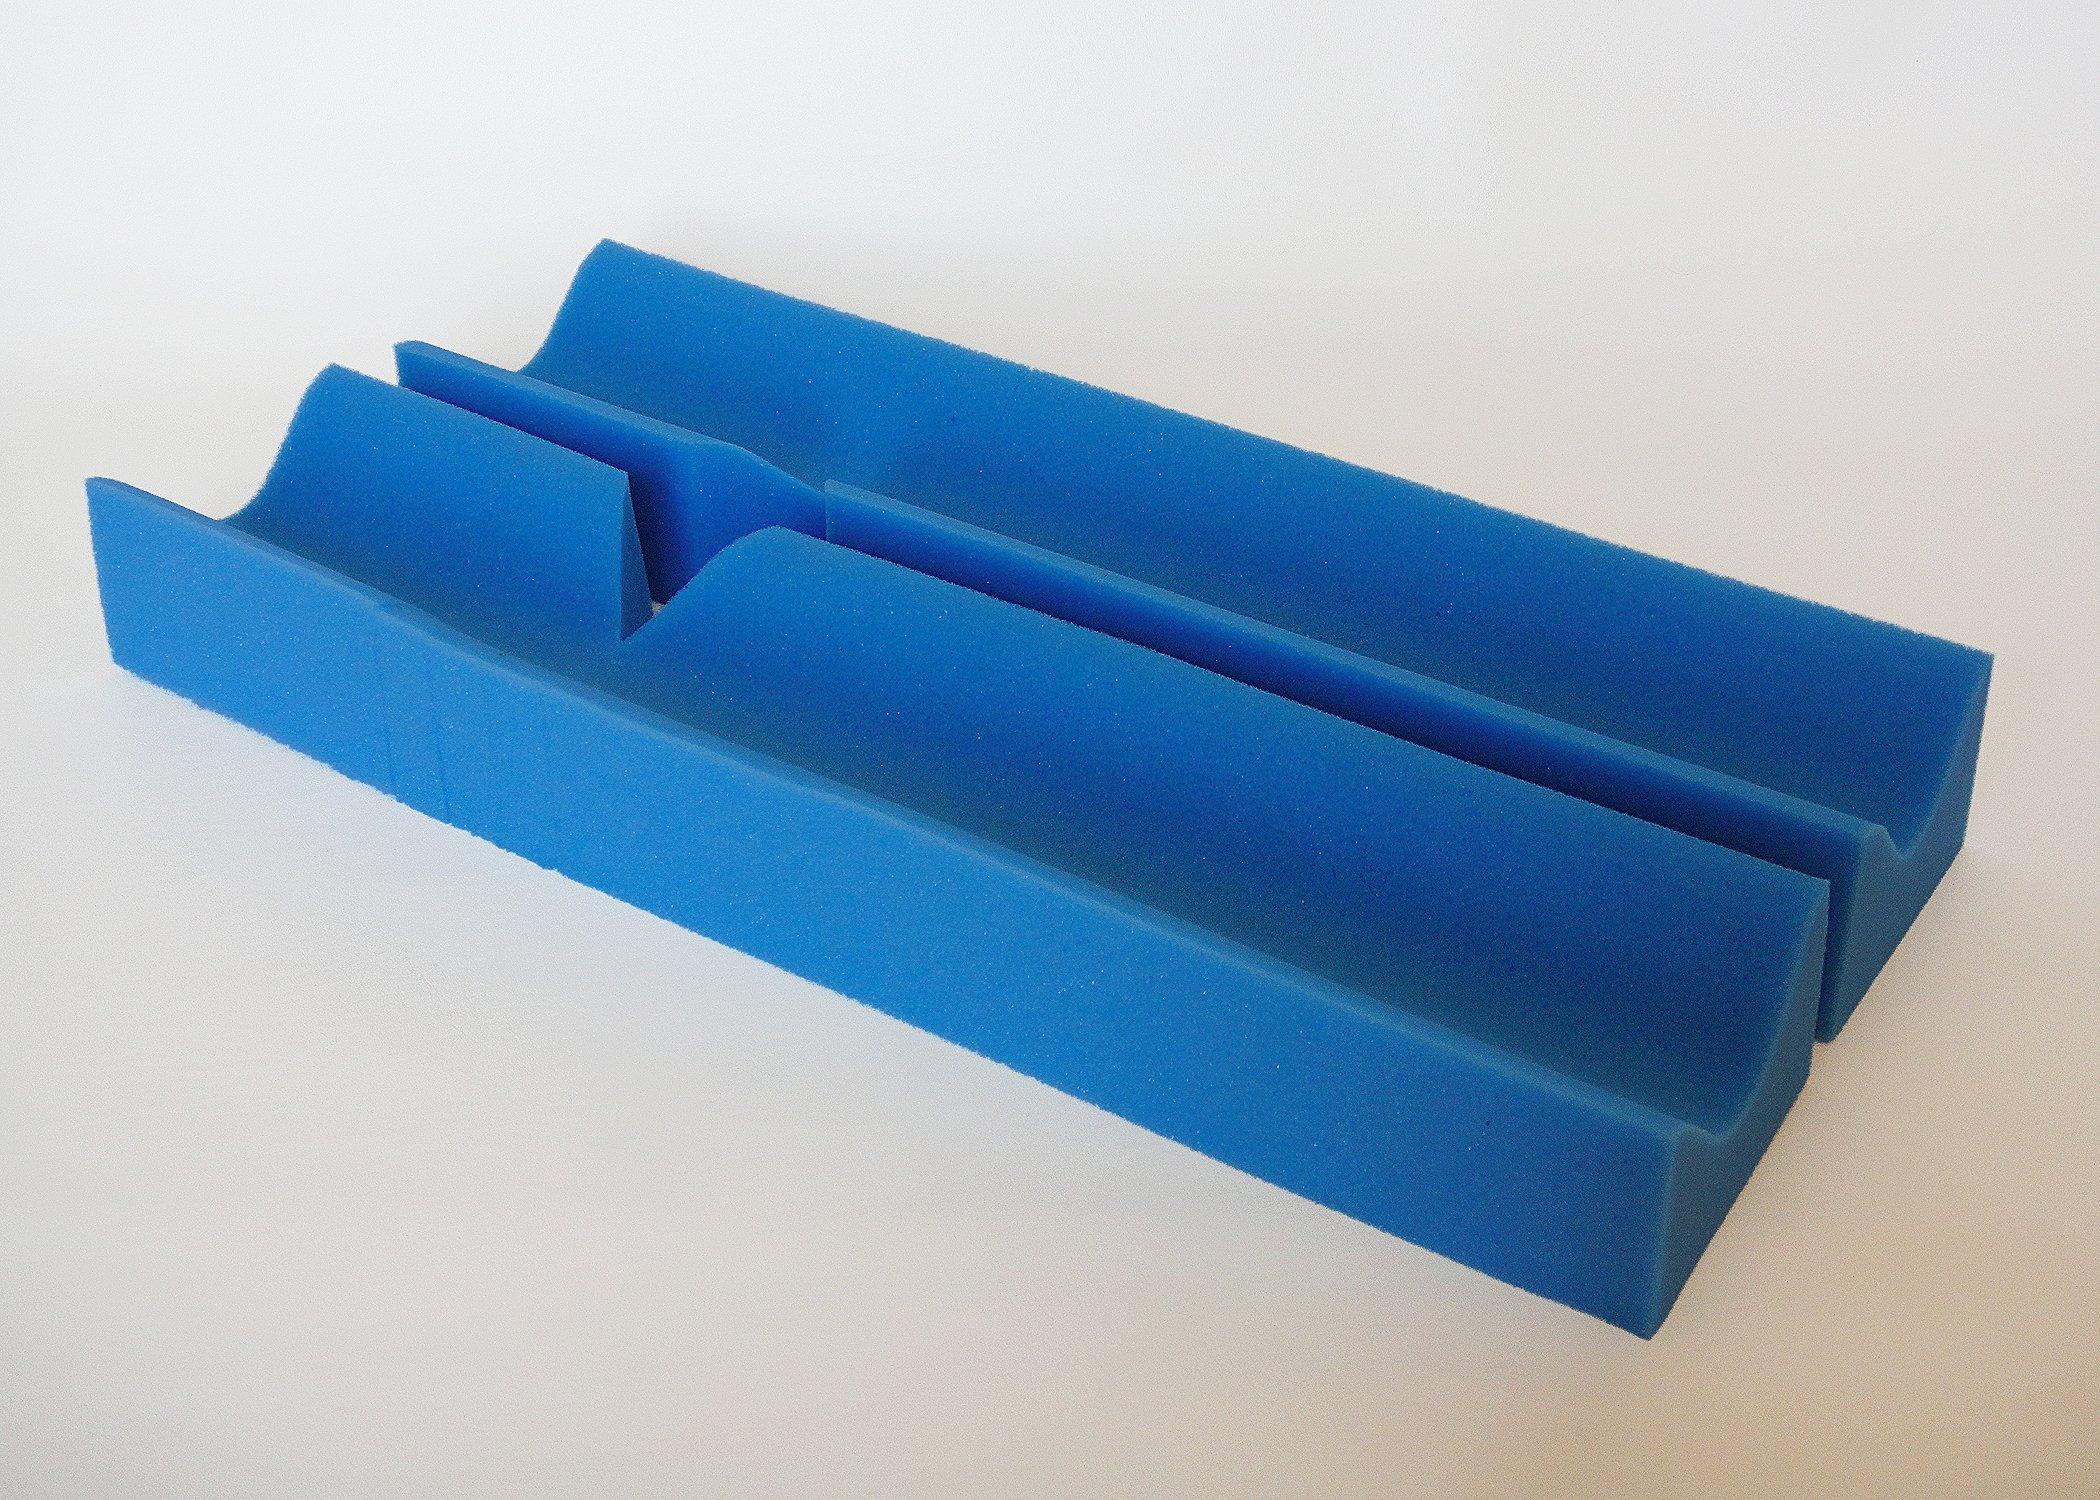 Single Use Foam Laminectomy Arm Cradle David Scott Company